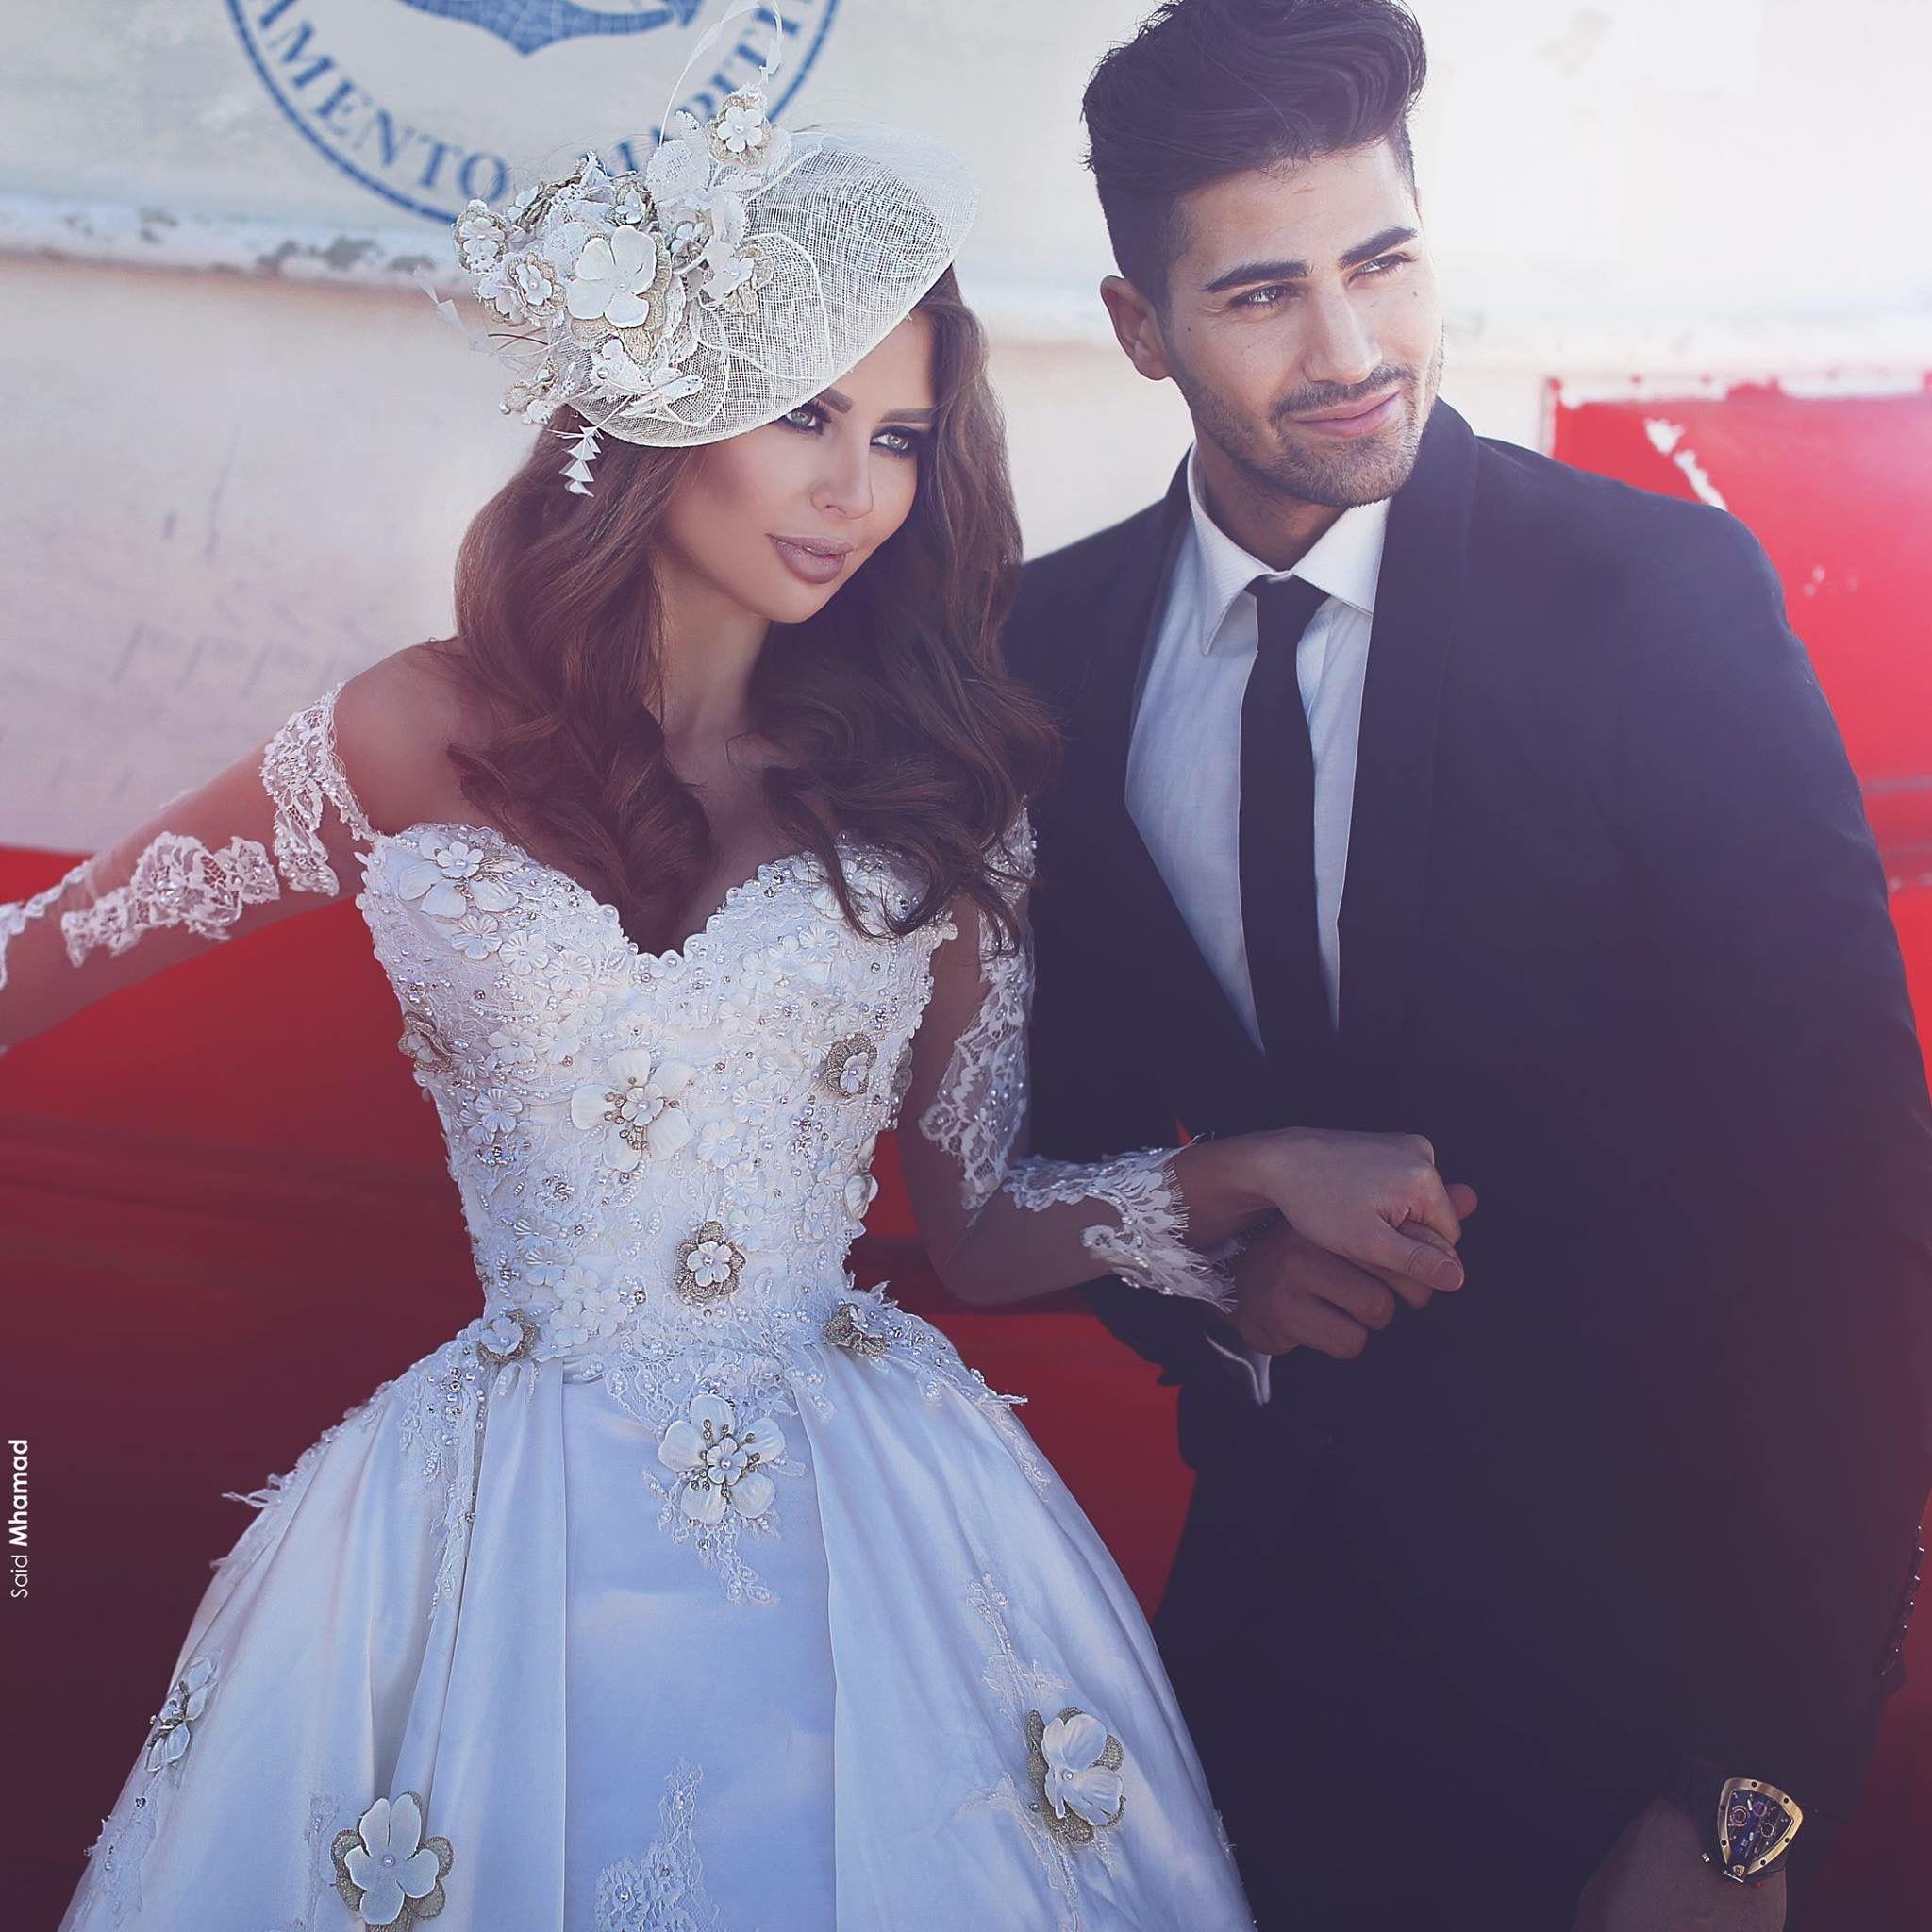 Ivory wedding dresses with sleeves  Pin by Mashallah Leelah on Wedding Dresses u Cakes  Pinterest